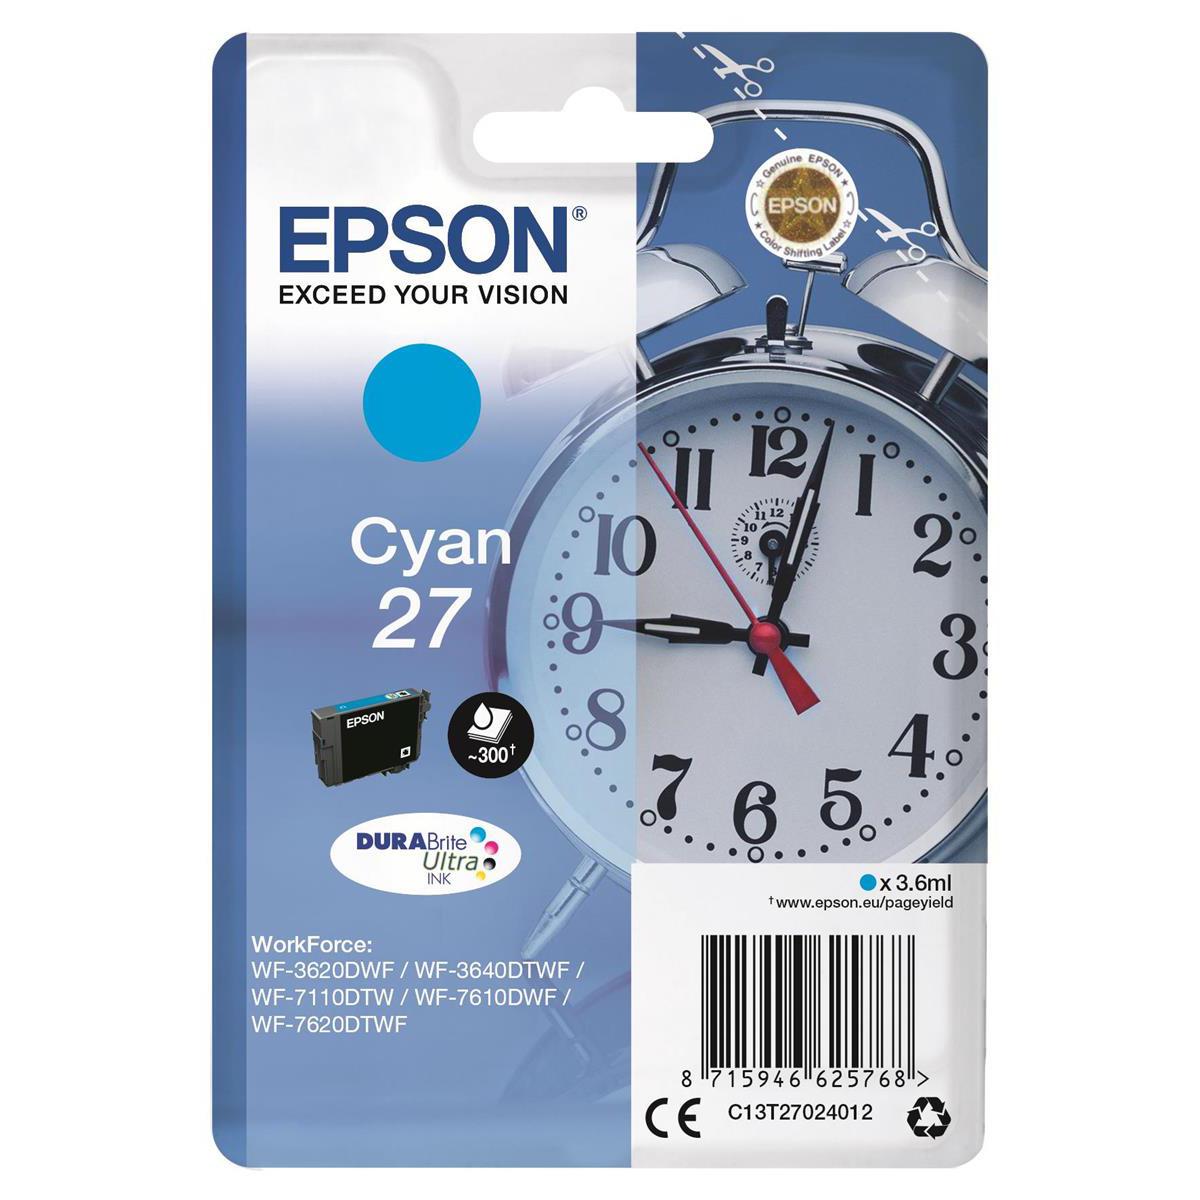 Inkjet Cartridges Epson 27 Inkjet Cartridge Alarm Clock Page Life 300pp 3.6ml Cyan Ref C13T27024012